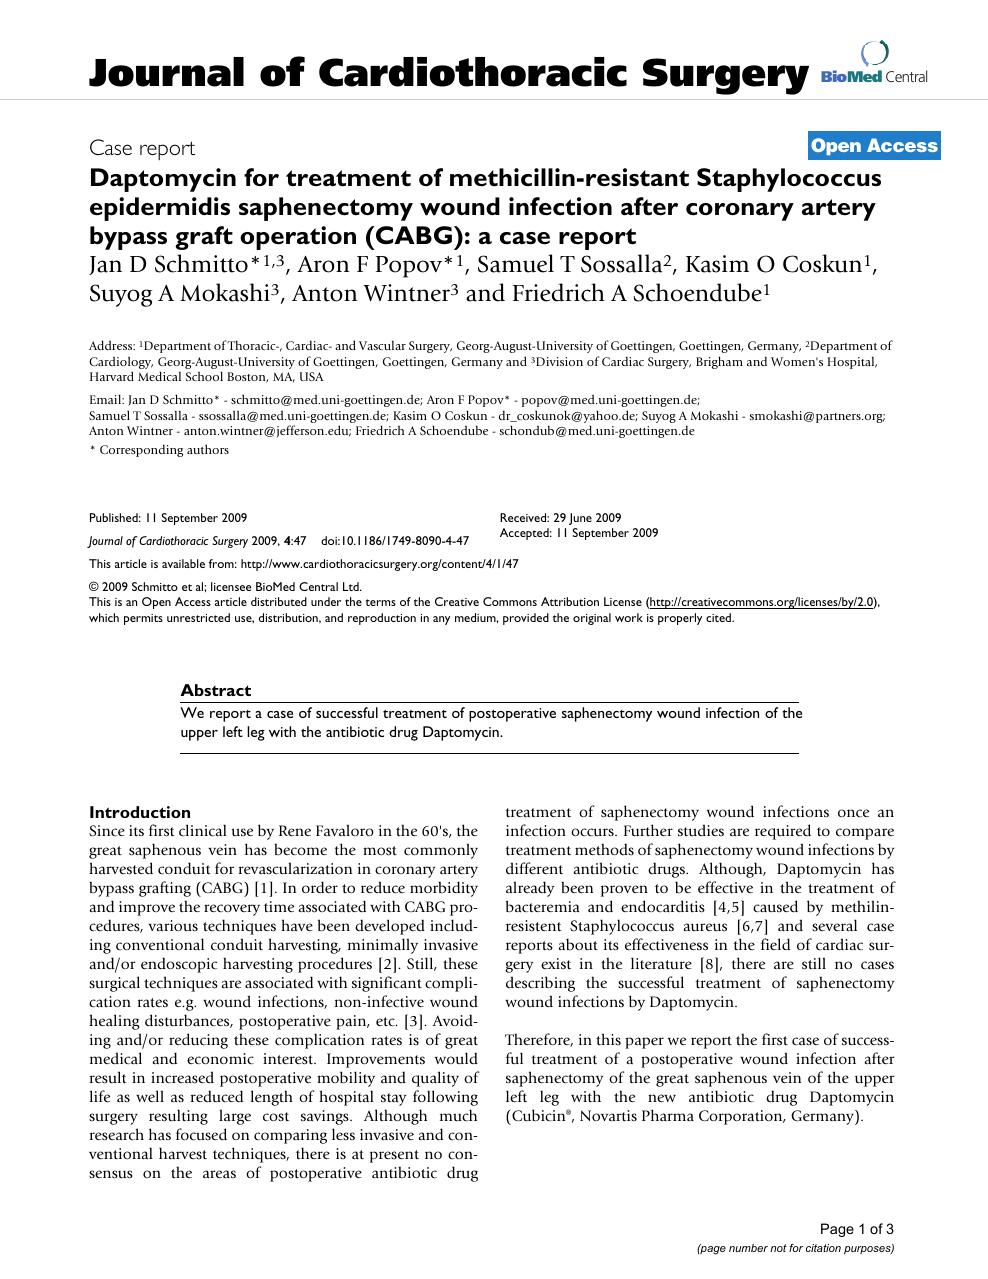 Daptomycin for treatment of methicillin-resistant Staphylococcus